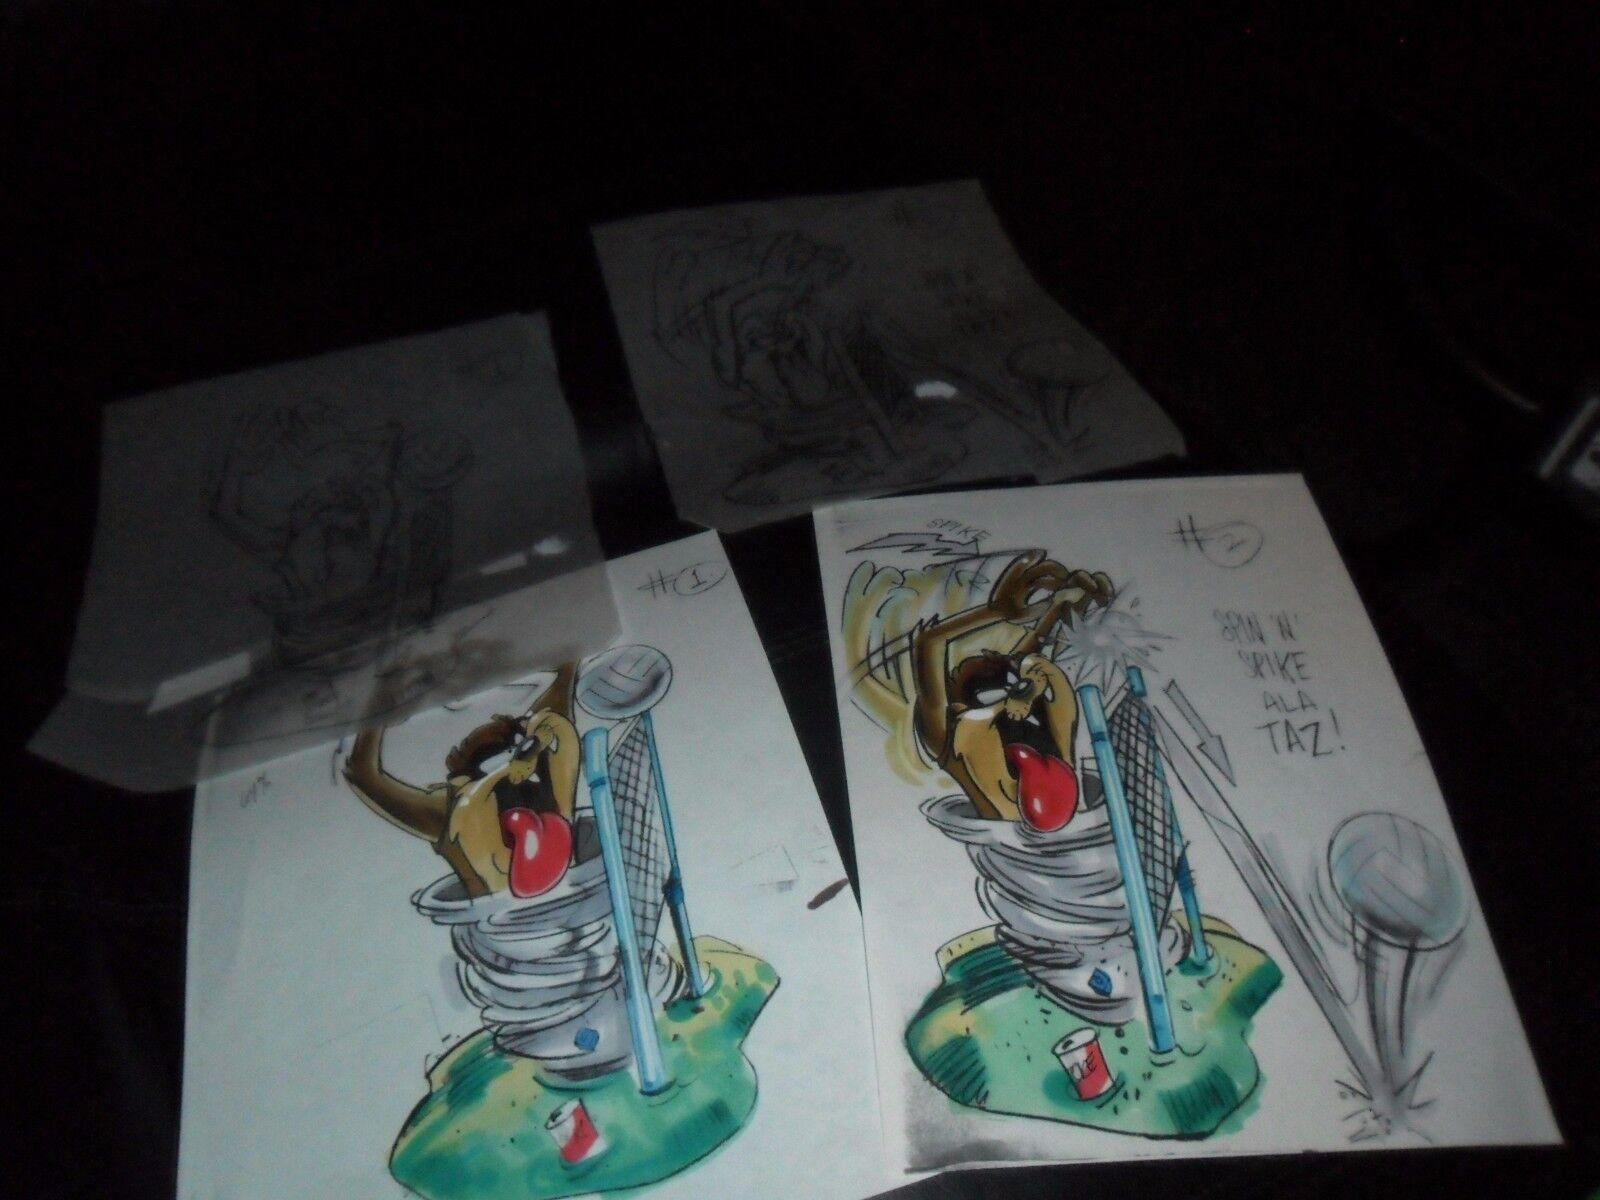 4 PIECE Lot URSPRUNG konst TASMANNIAN DEVIL TAZ VOLLEYboll KFC FAST FOOD leksak